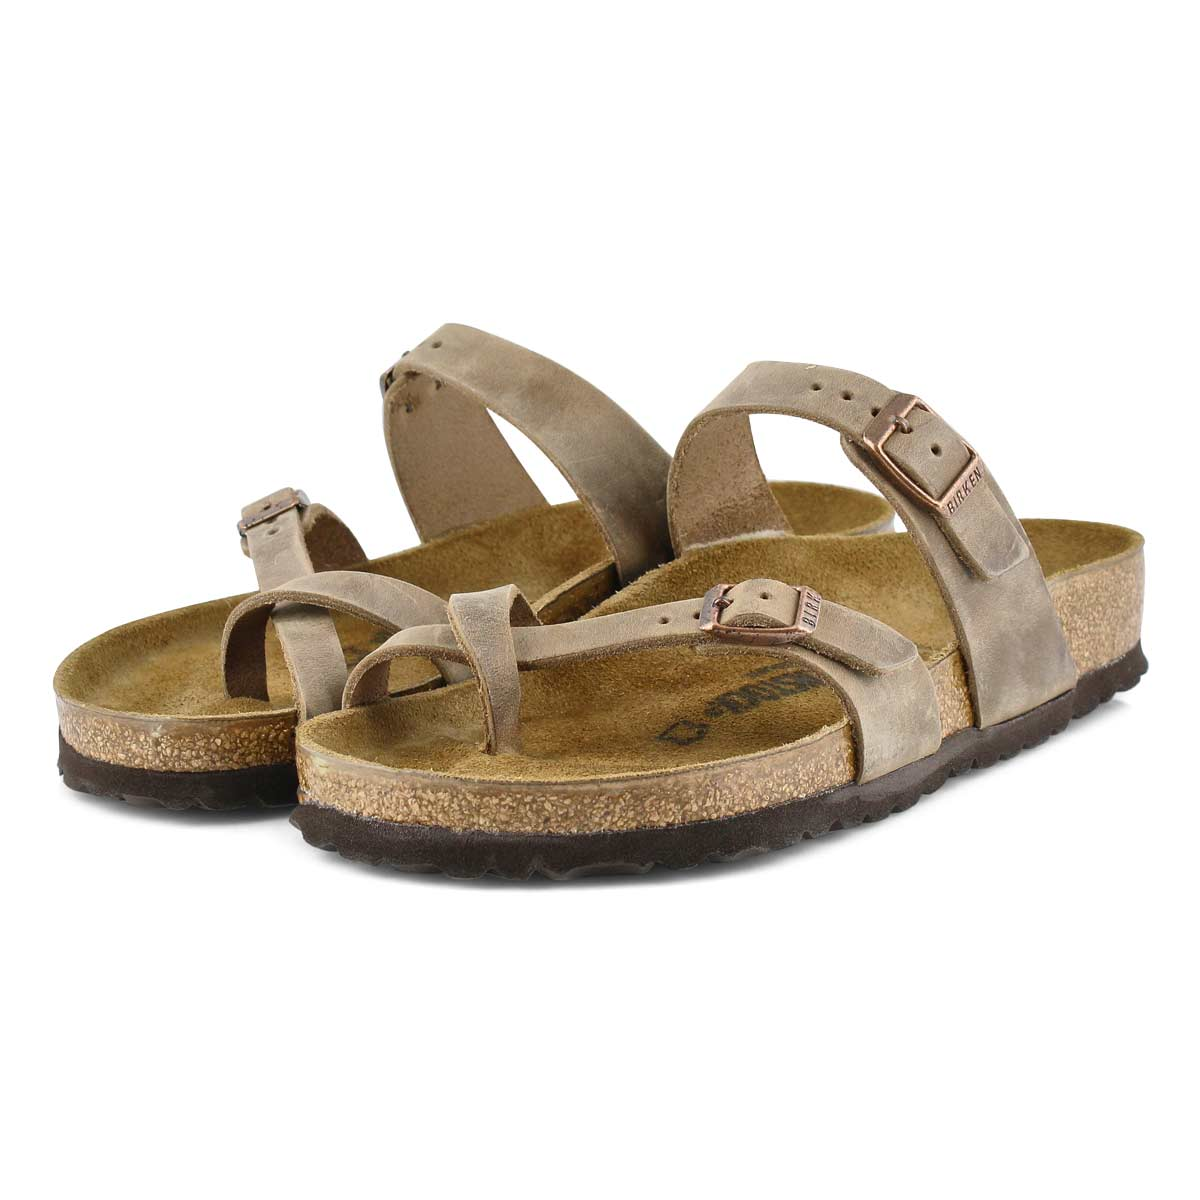 Sandale passe-orteil MAYARI, tabac femme